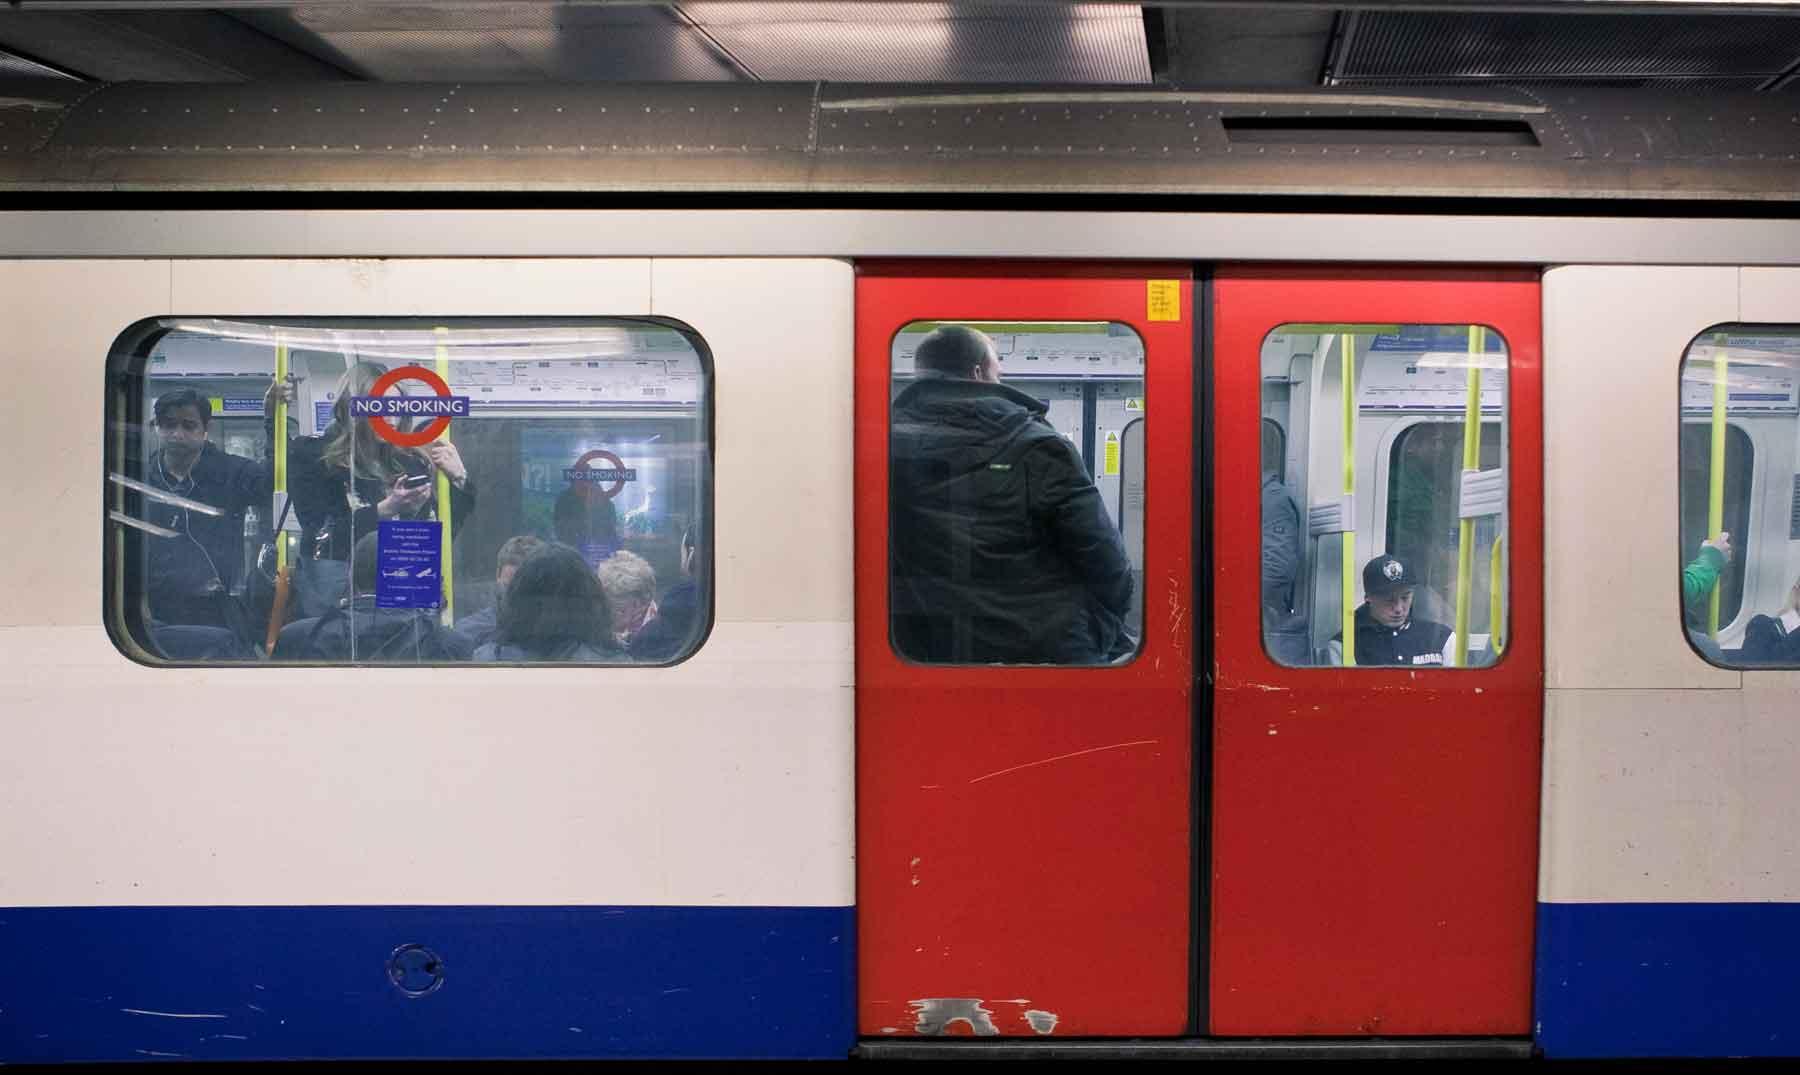 La historia misteriosa del metro de Londres